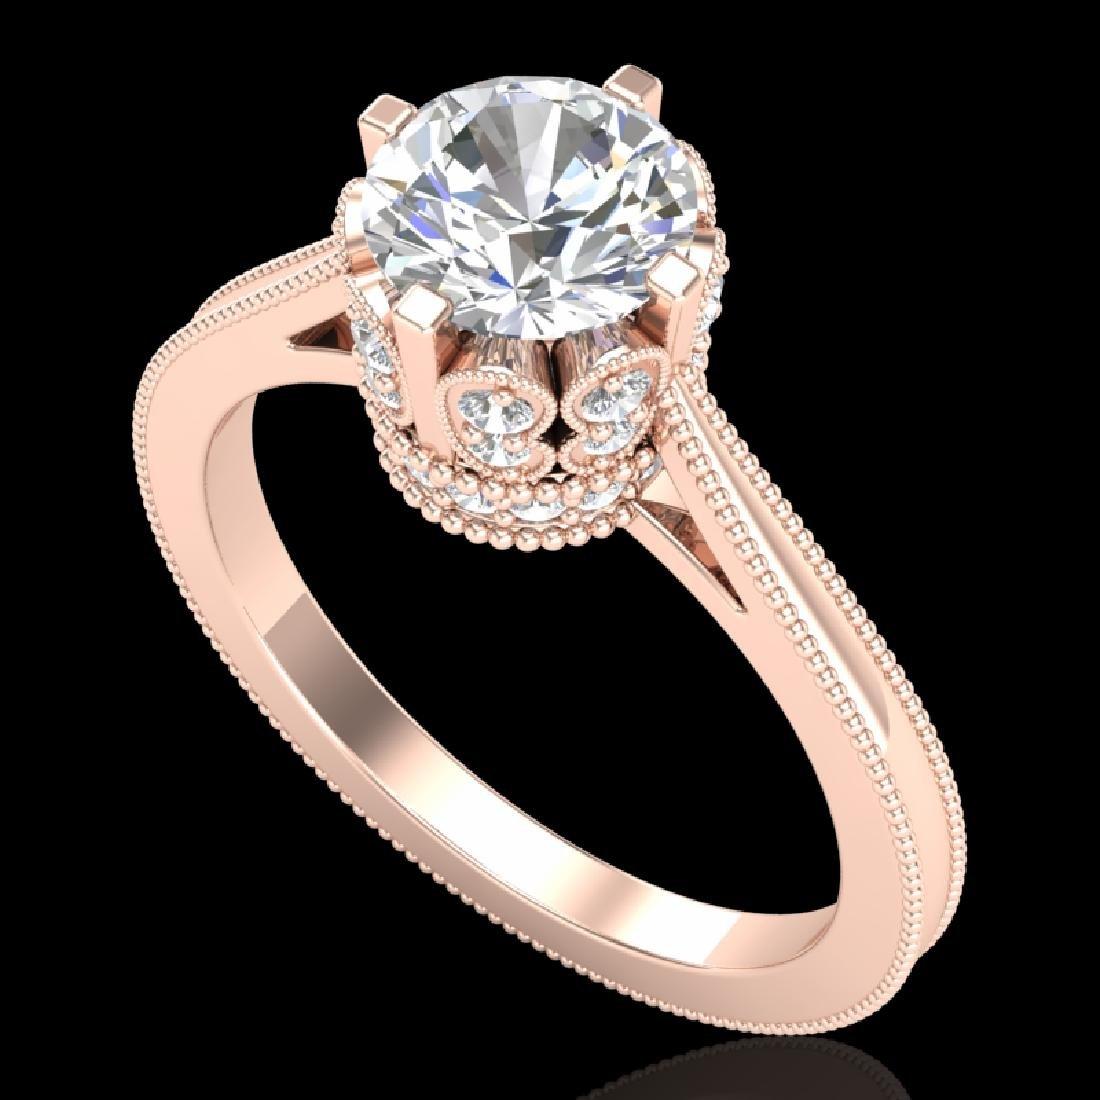 1.5 CTW VS/SI Diamond Art Deco Ring 18K Rose Gold